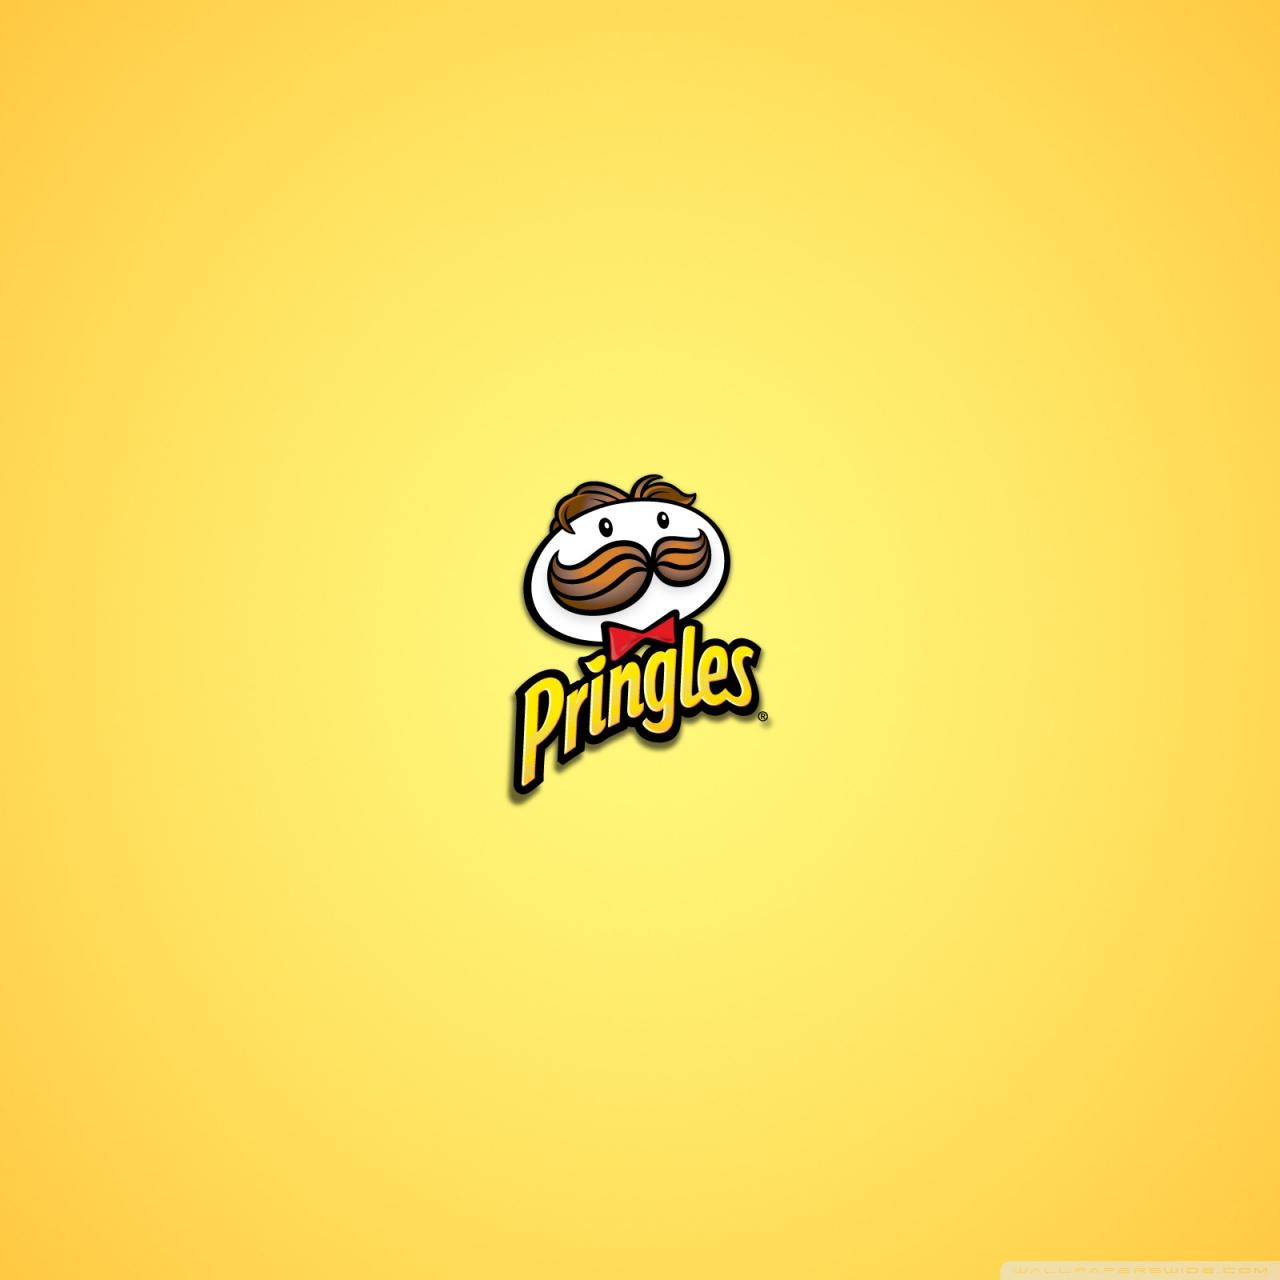 Pringles Guy 4K HD Desktop Wallpaper for 4K Ultra HD TV Dual 1280x1280